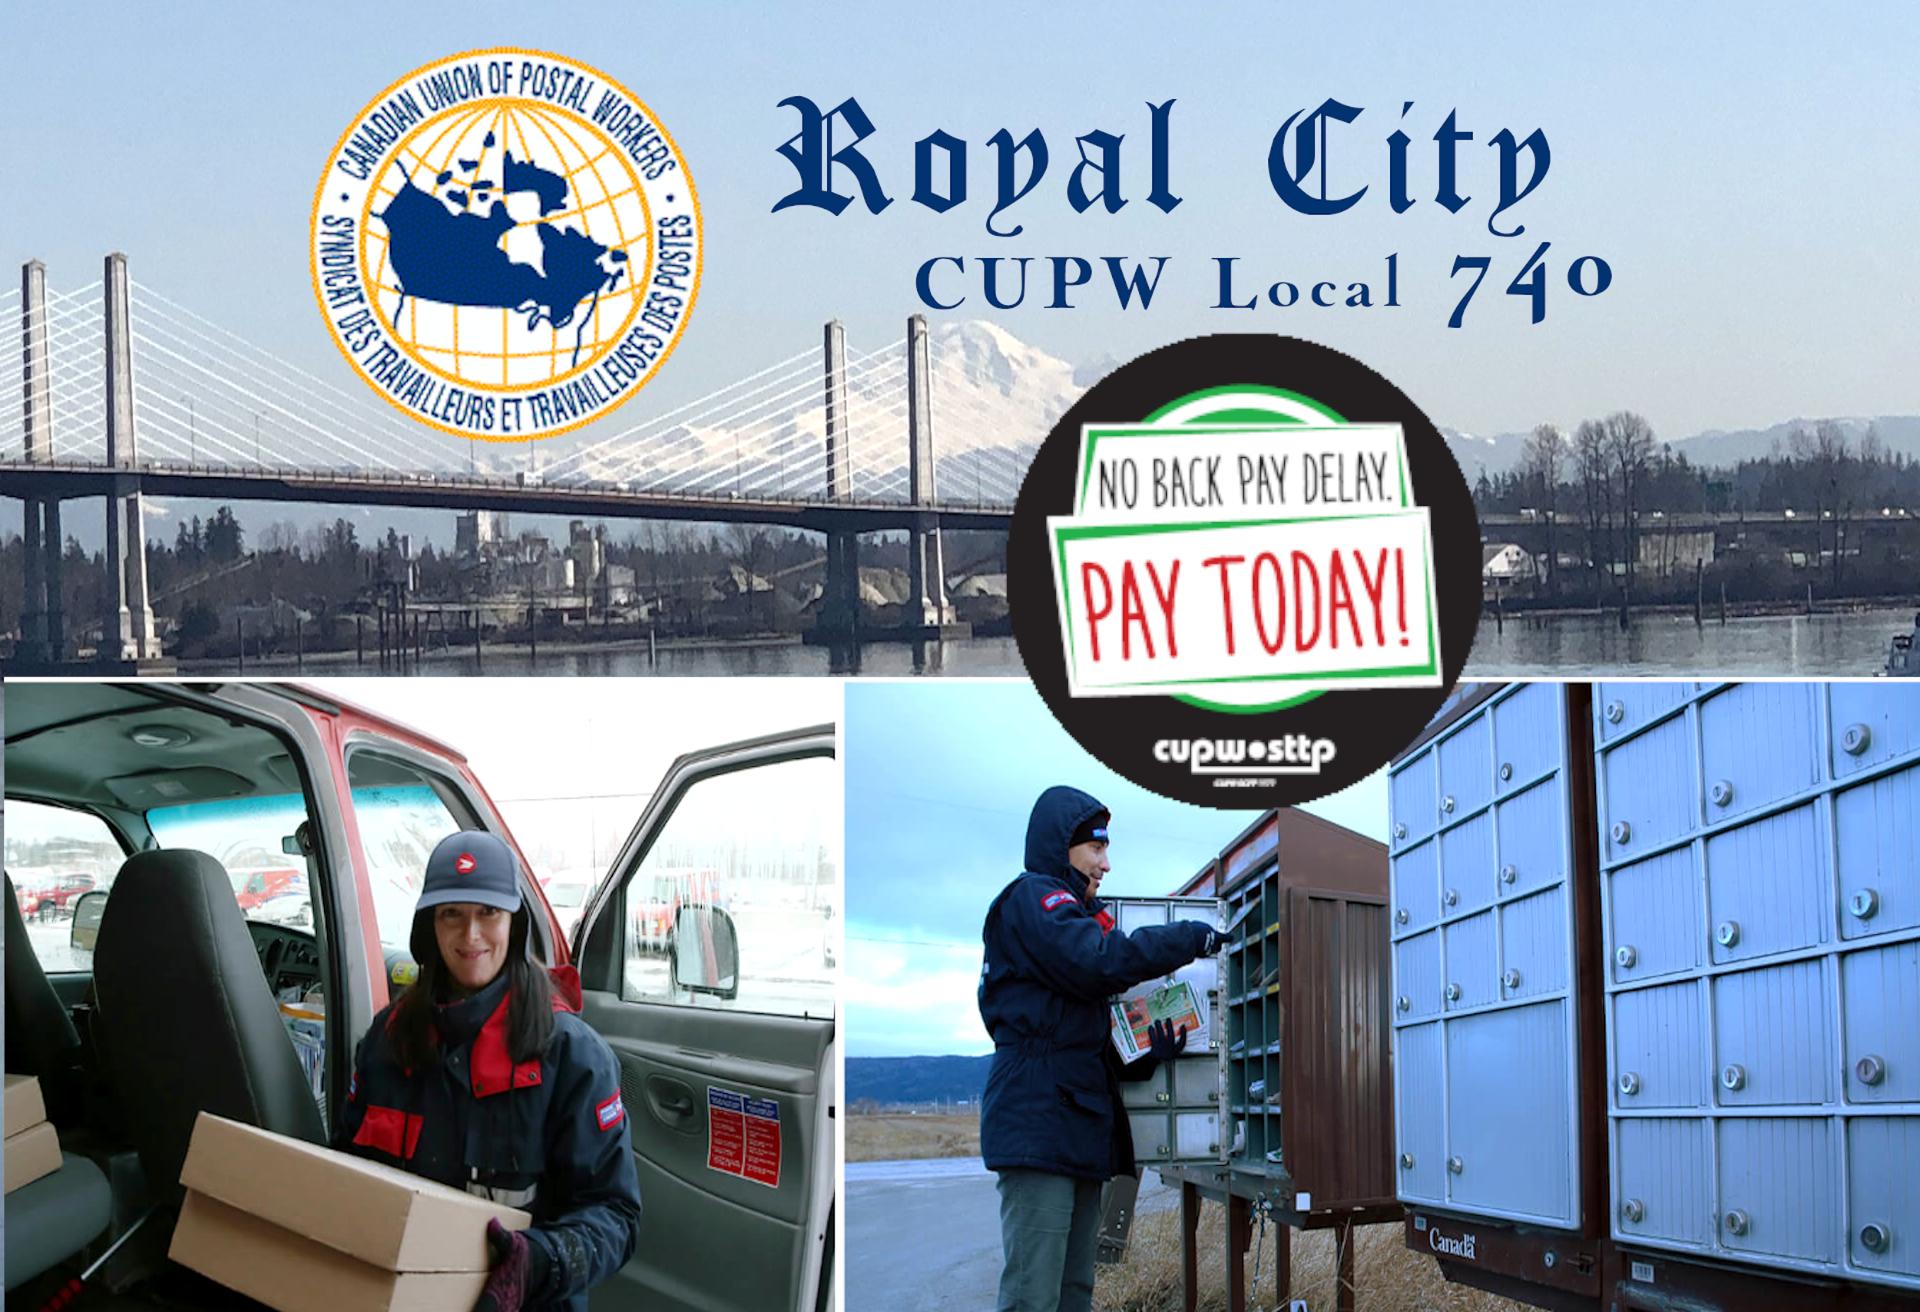 CUPW RoyalCity 740 Logo